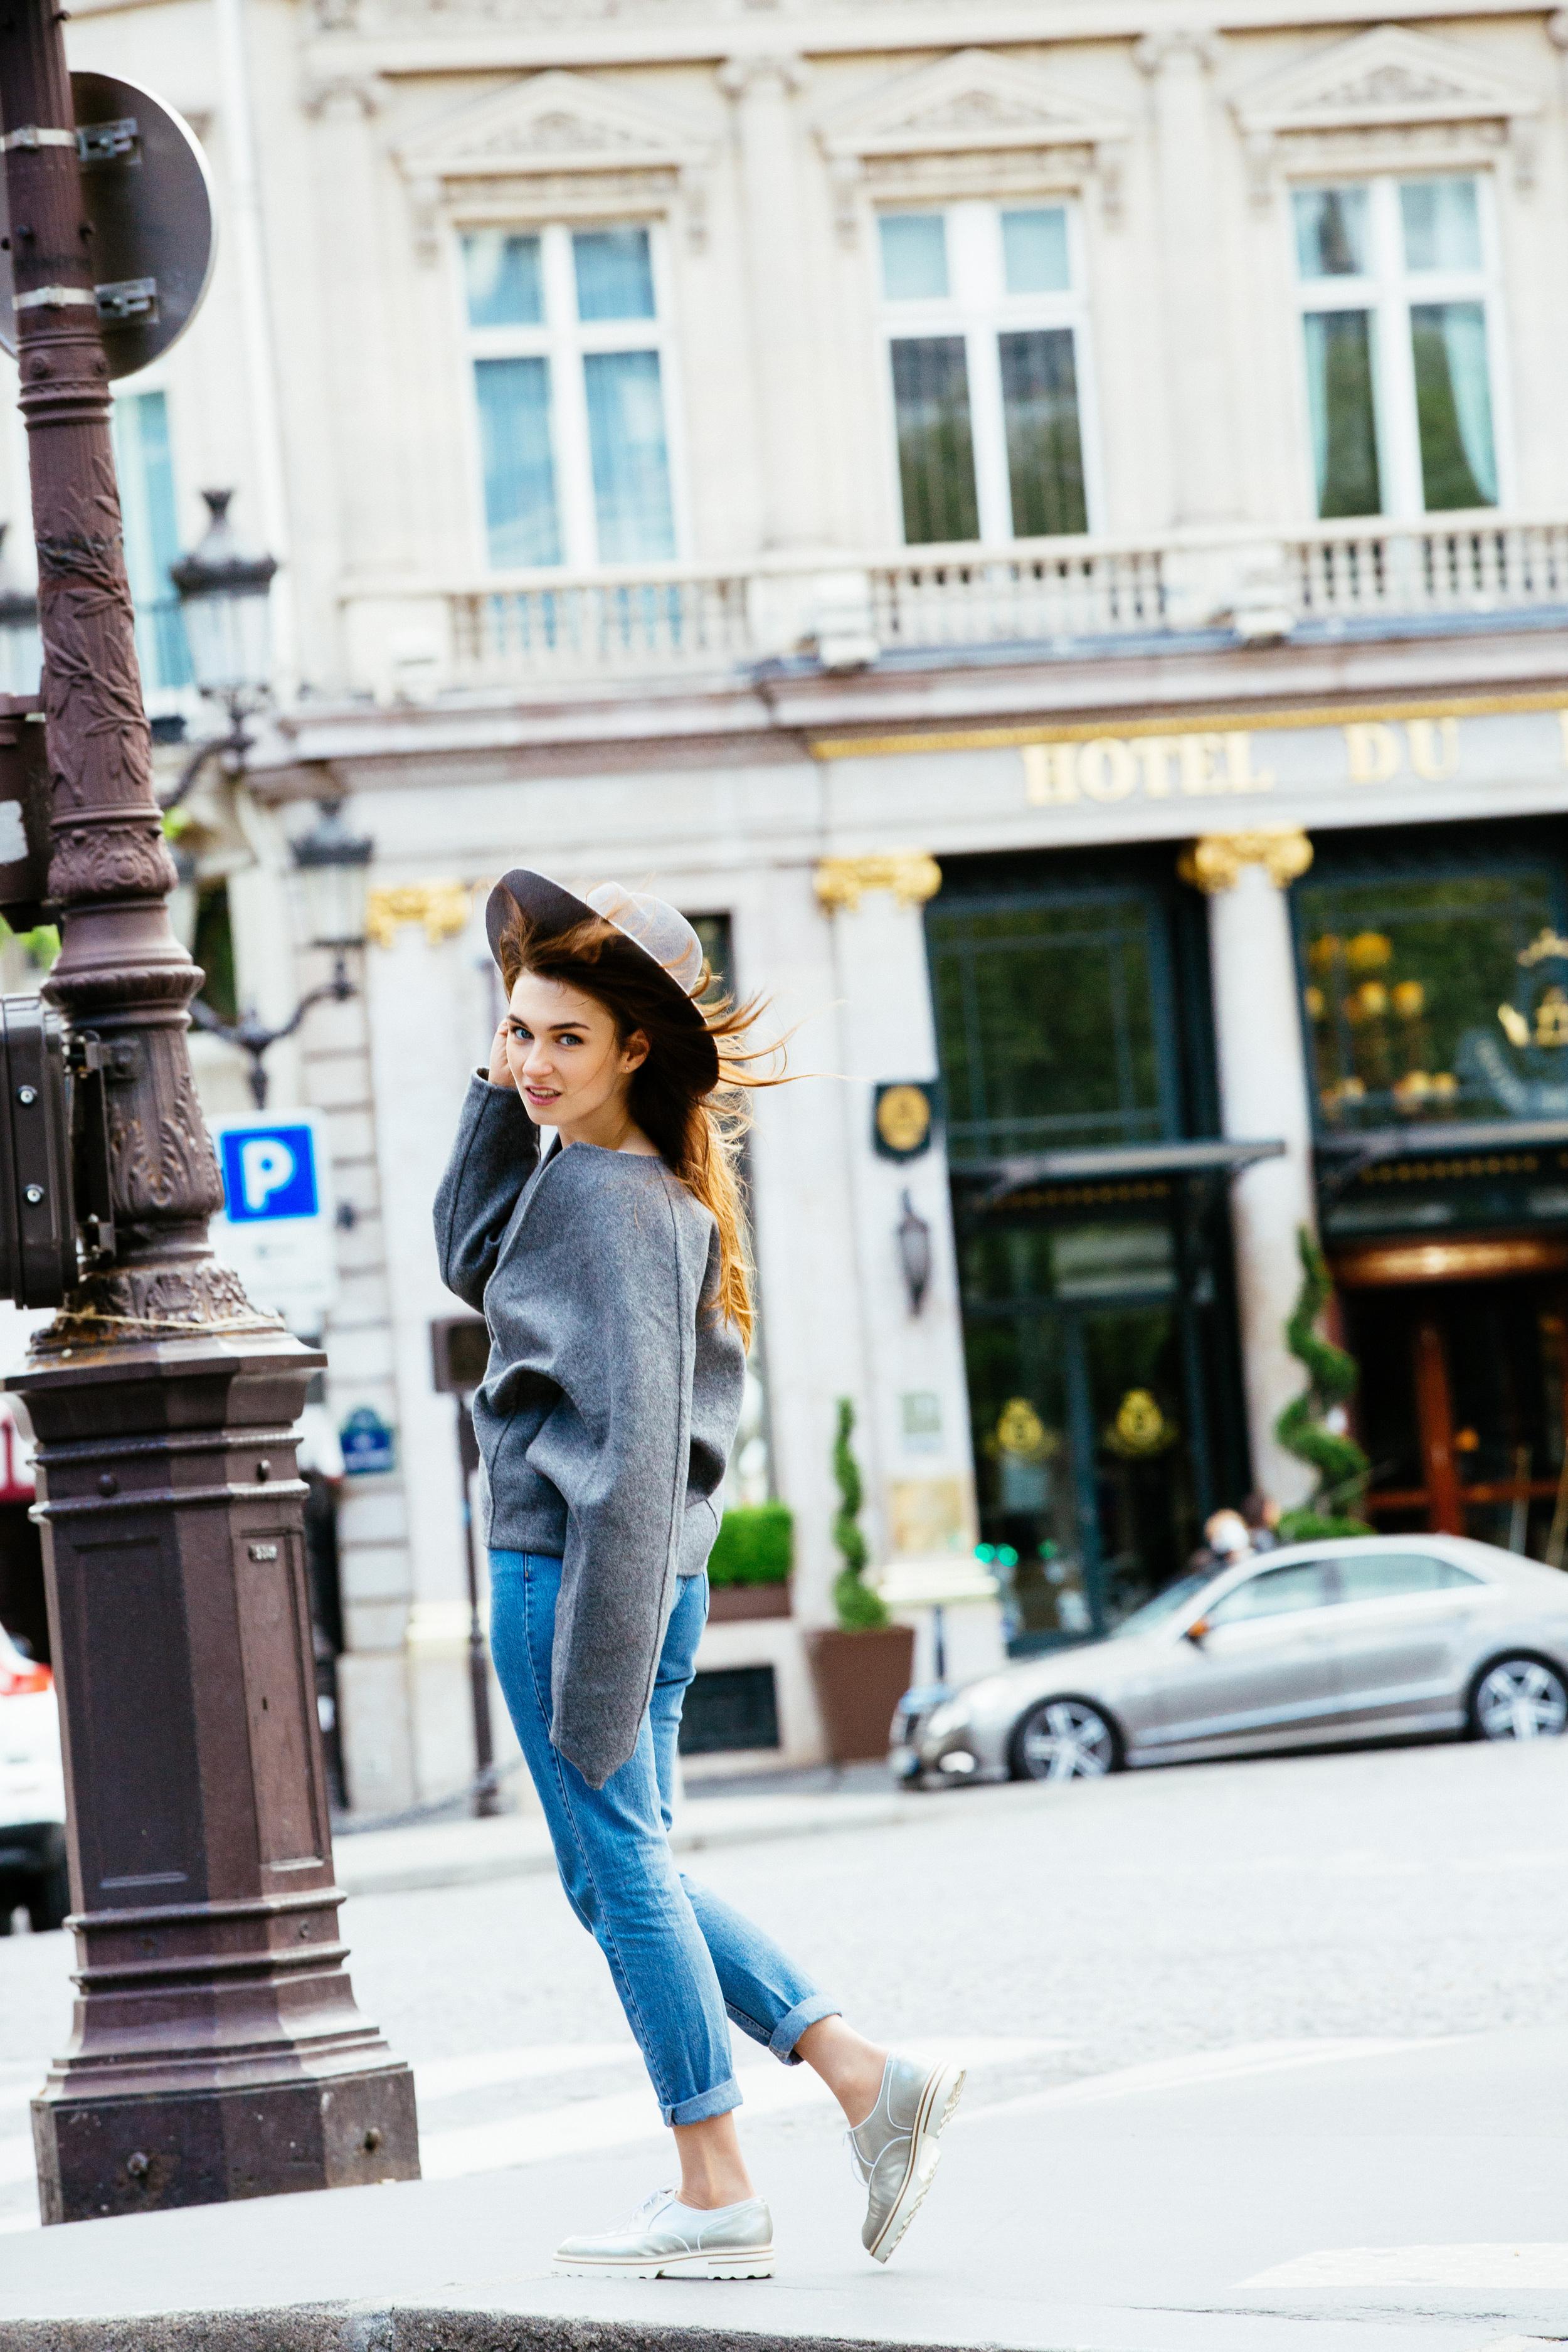 Paris Photographer Street style Lookbook Brand Iheartparisfr